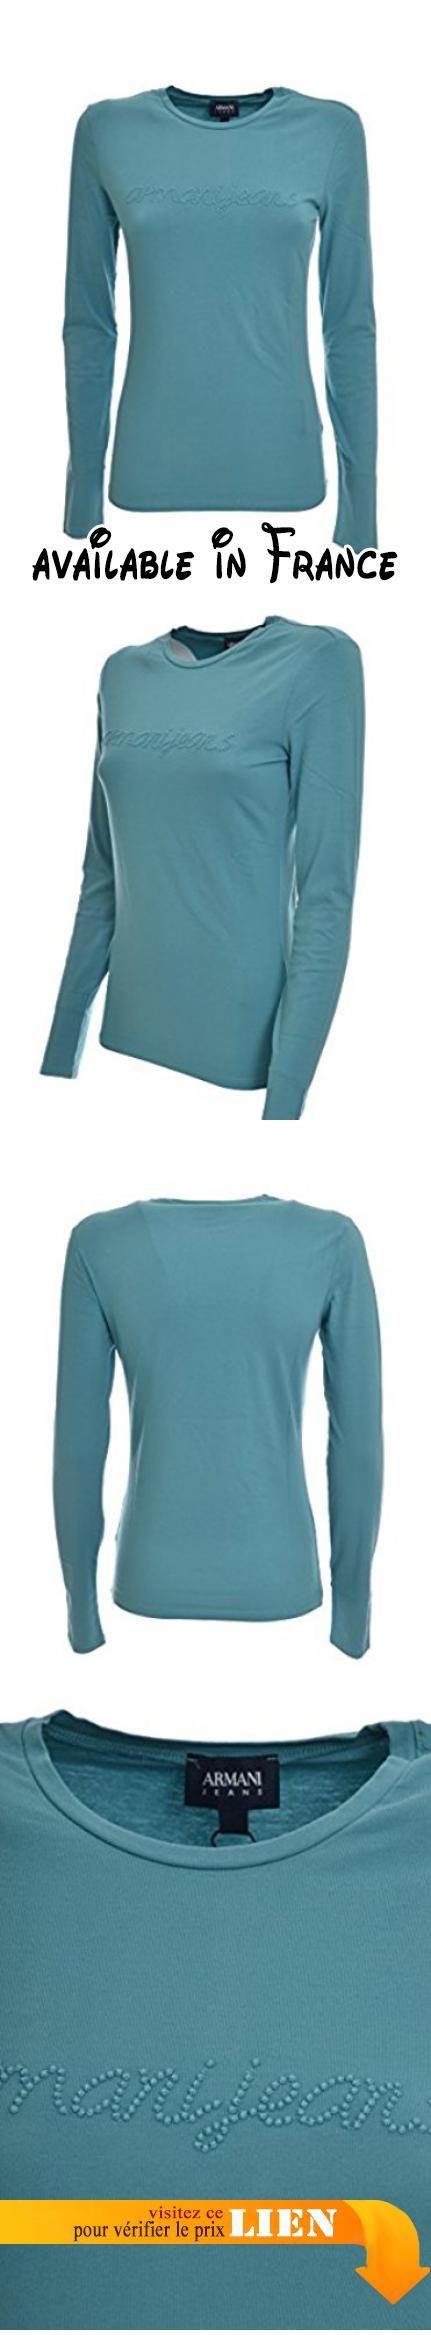 B076cswbrl Turquoise Armani Ciel 44 Shirt Femme Bleu T qn1gHwqZ